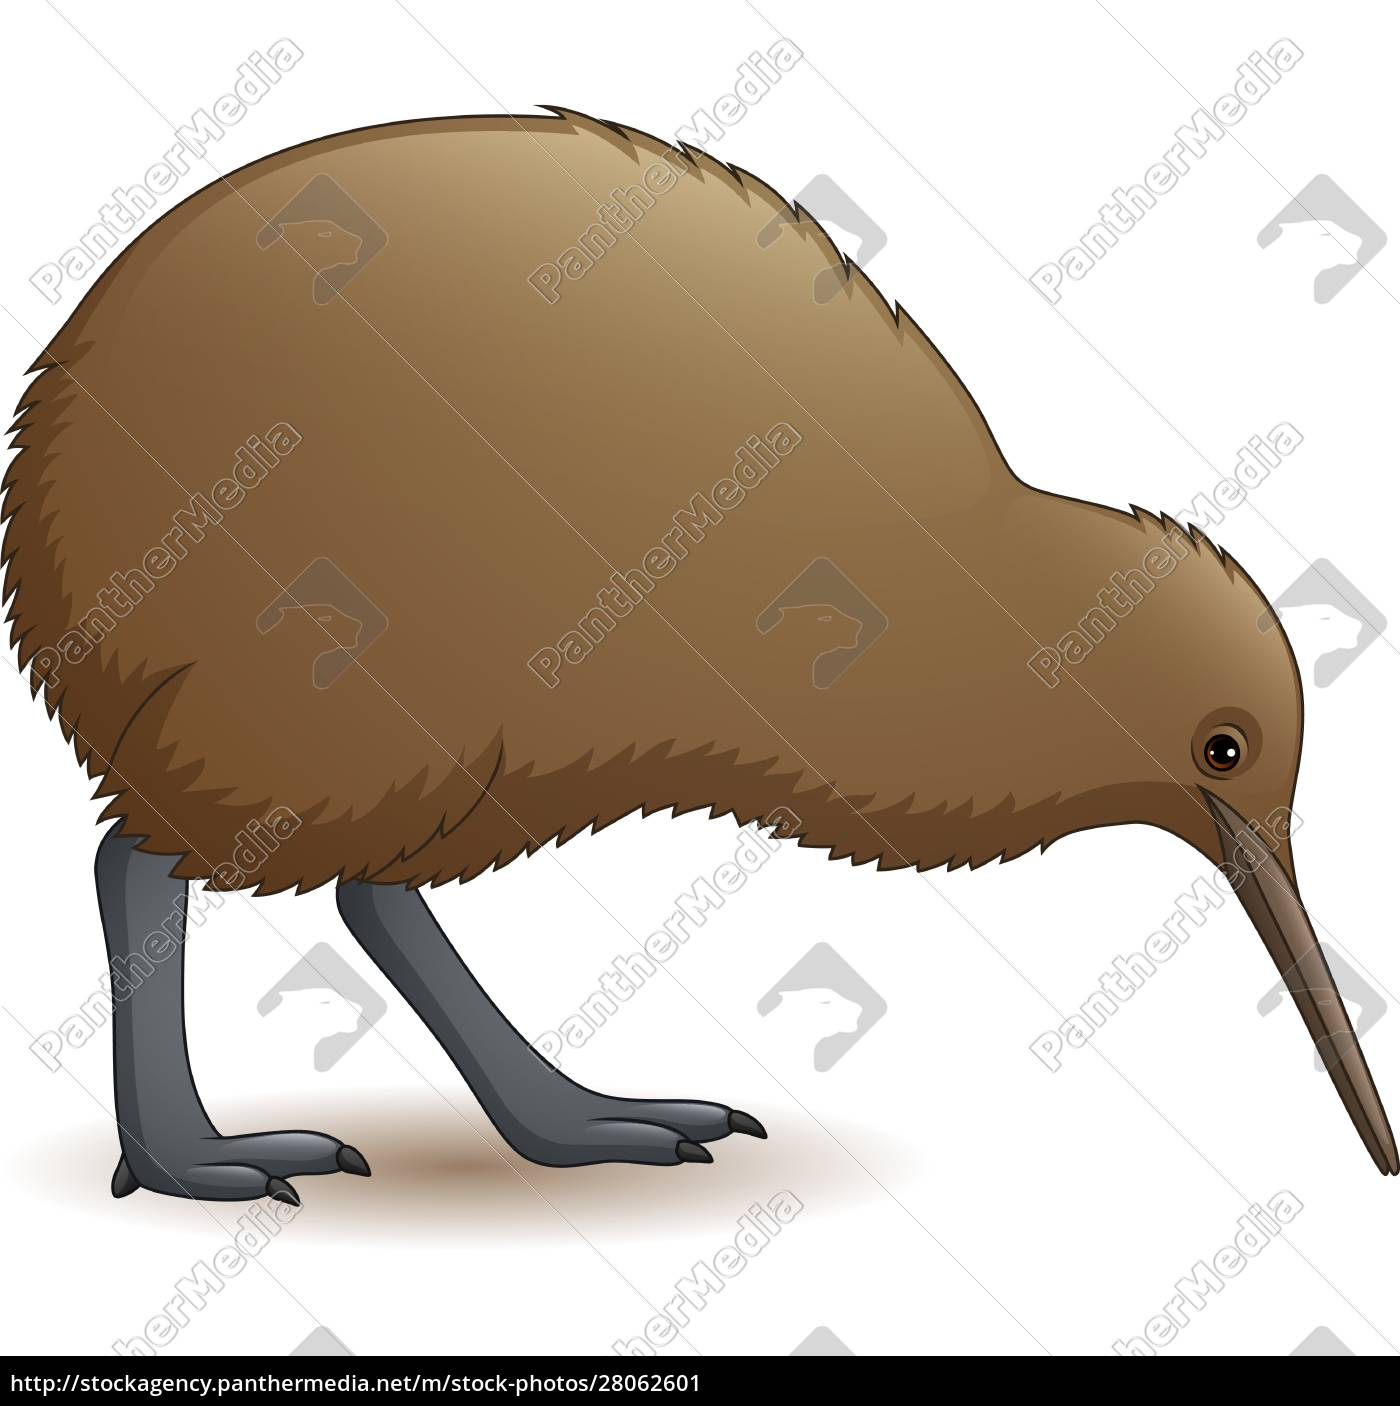 cartoon, funny, kiwi, bird - 28062601